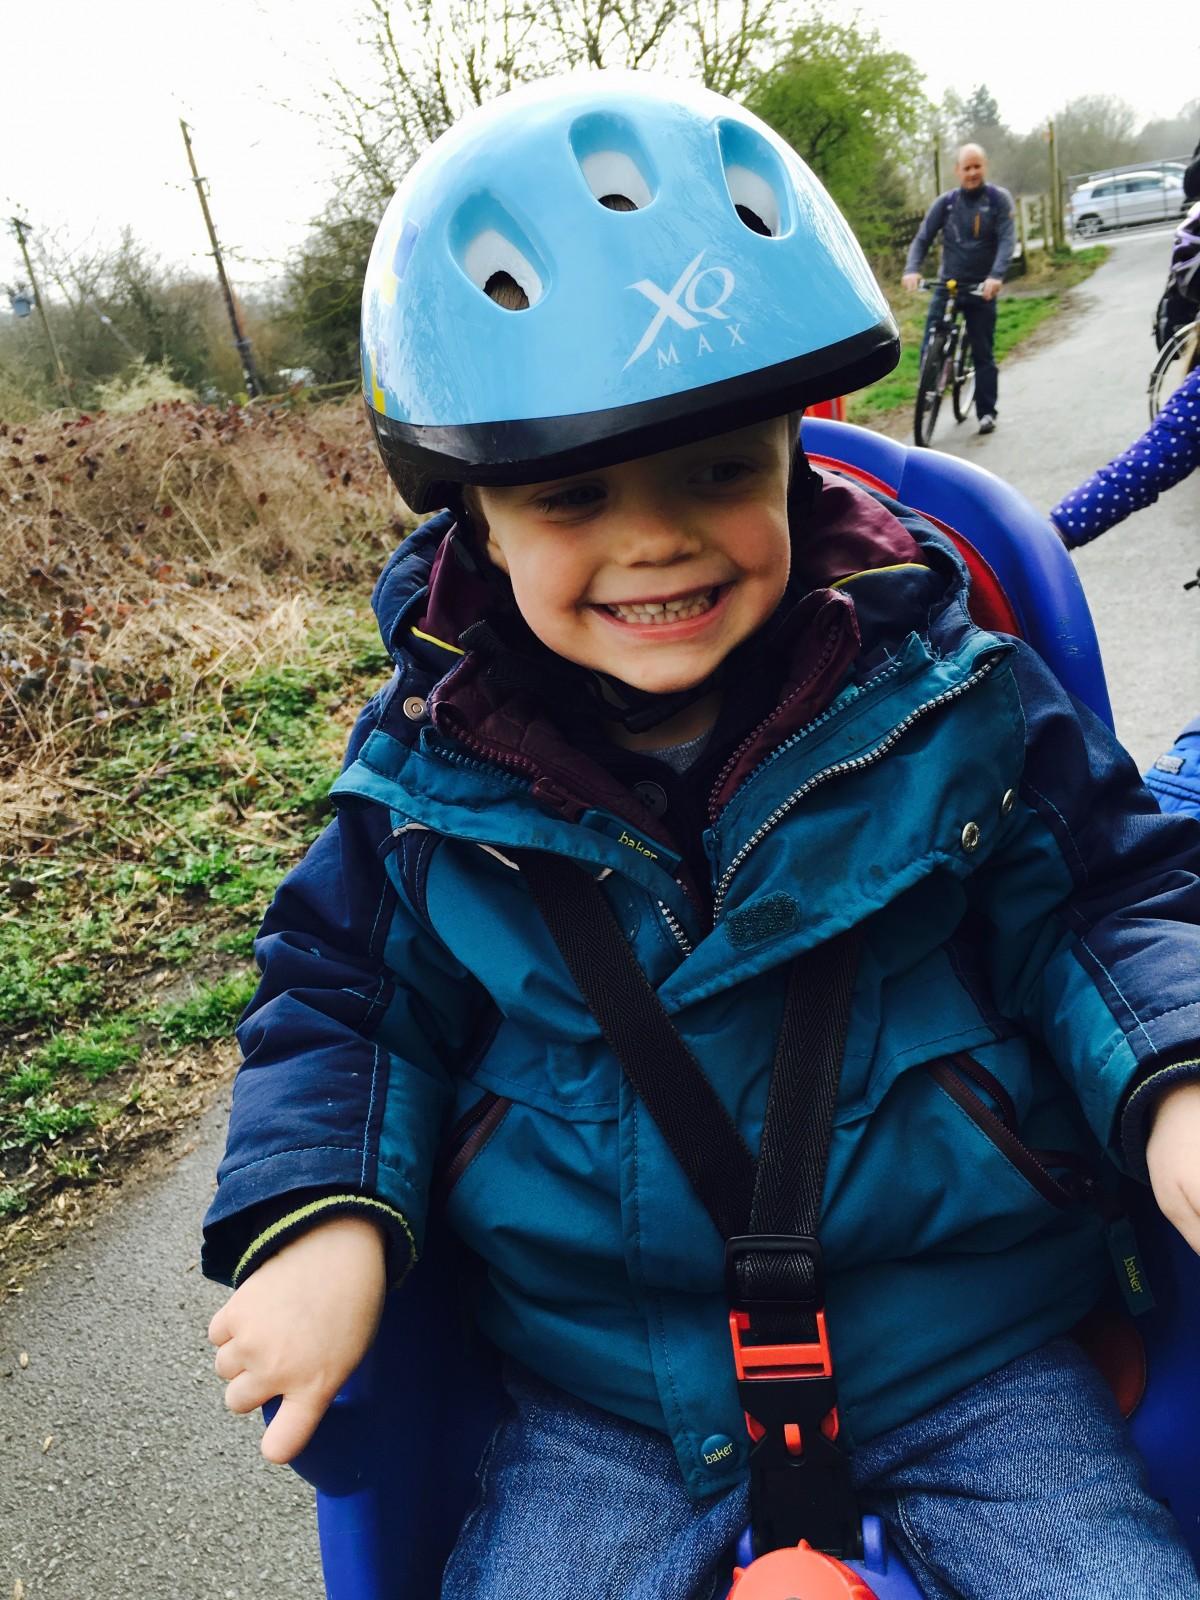 Harrogate Mama, Harrogate mums, Ripley Bike ride, Ripley, kids bike ride Harrogate, IMG_8635